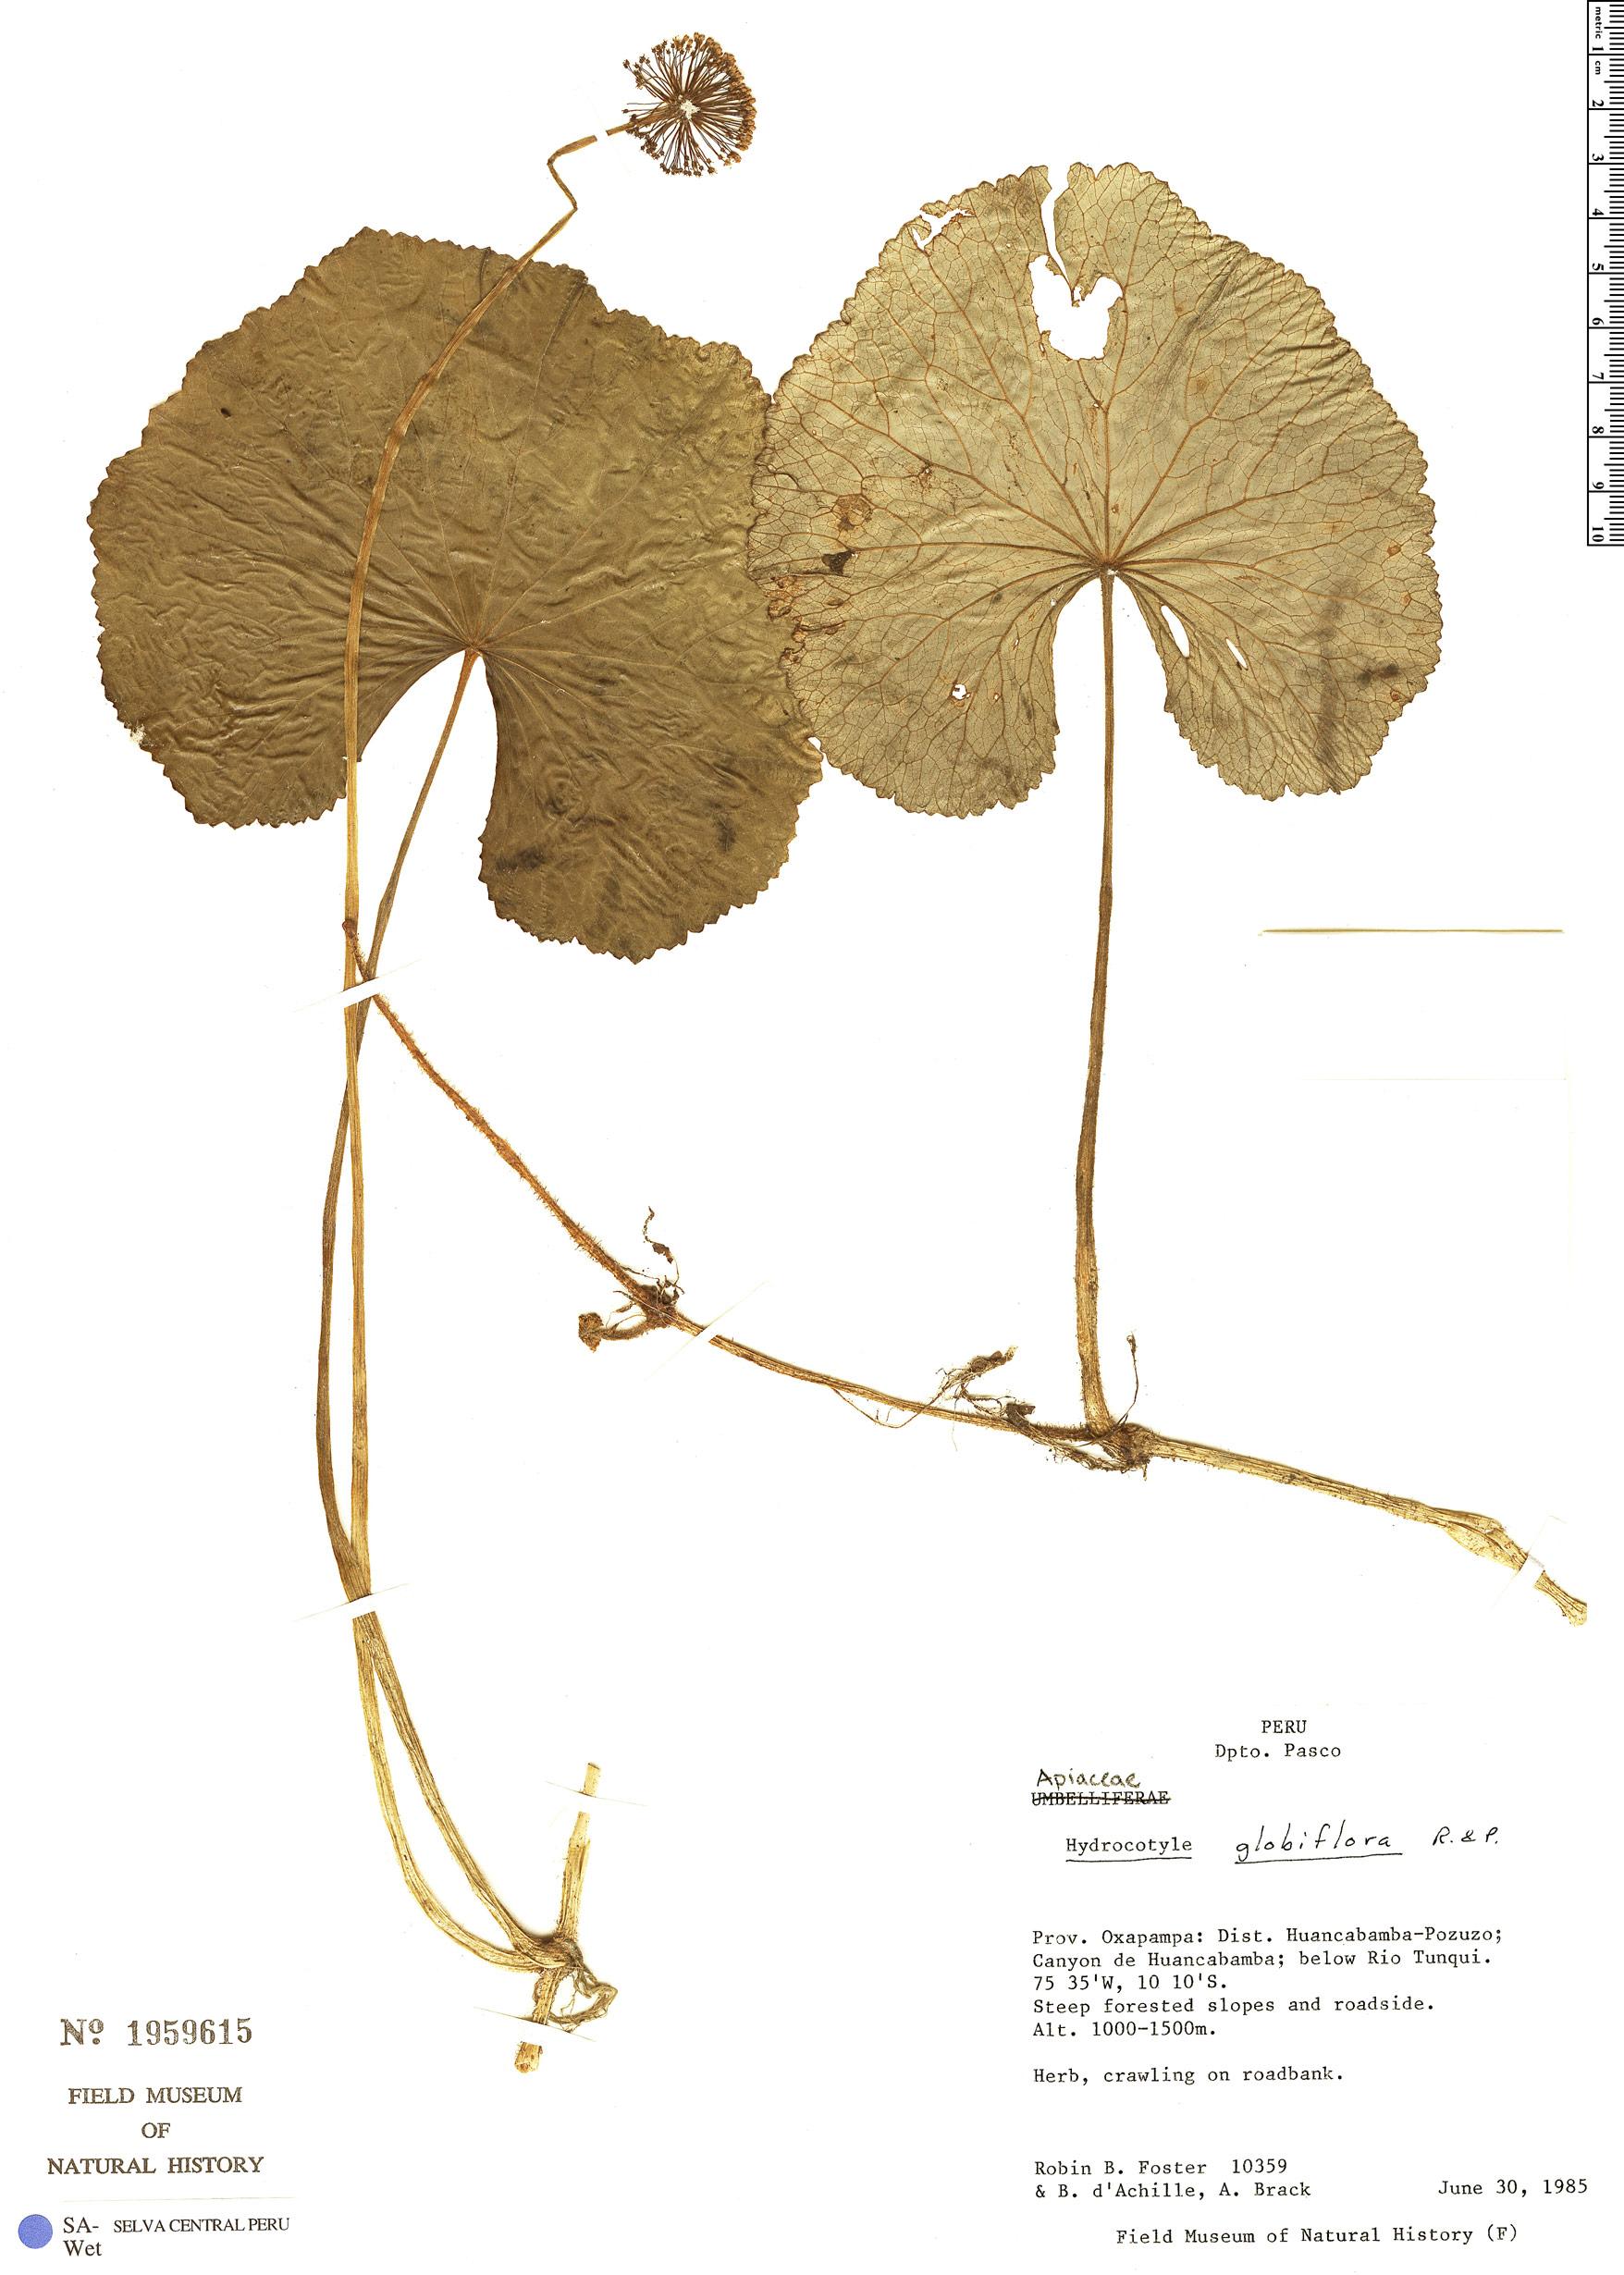 Specimen: Hydrocotyle globiflora